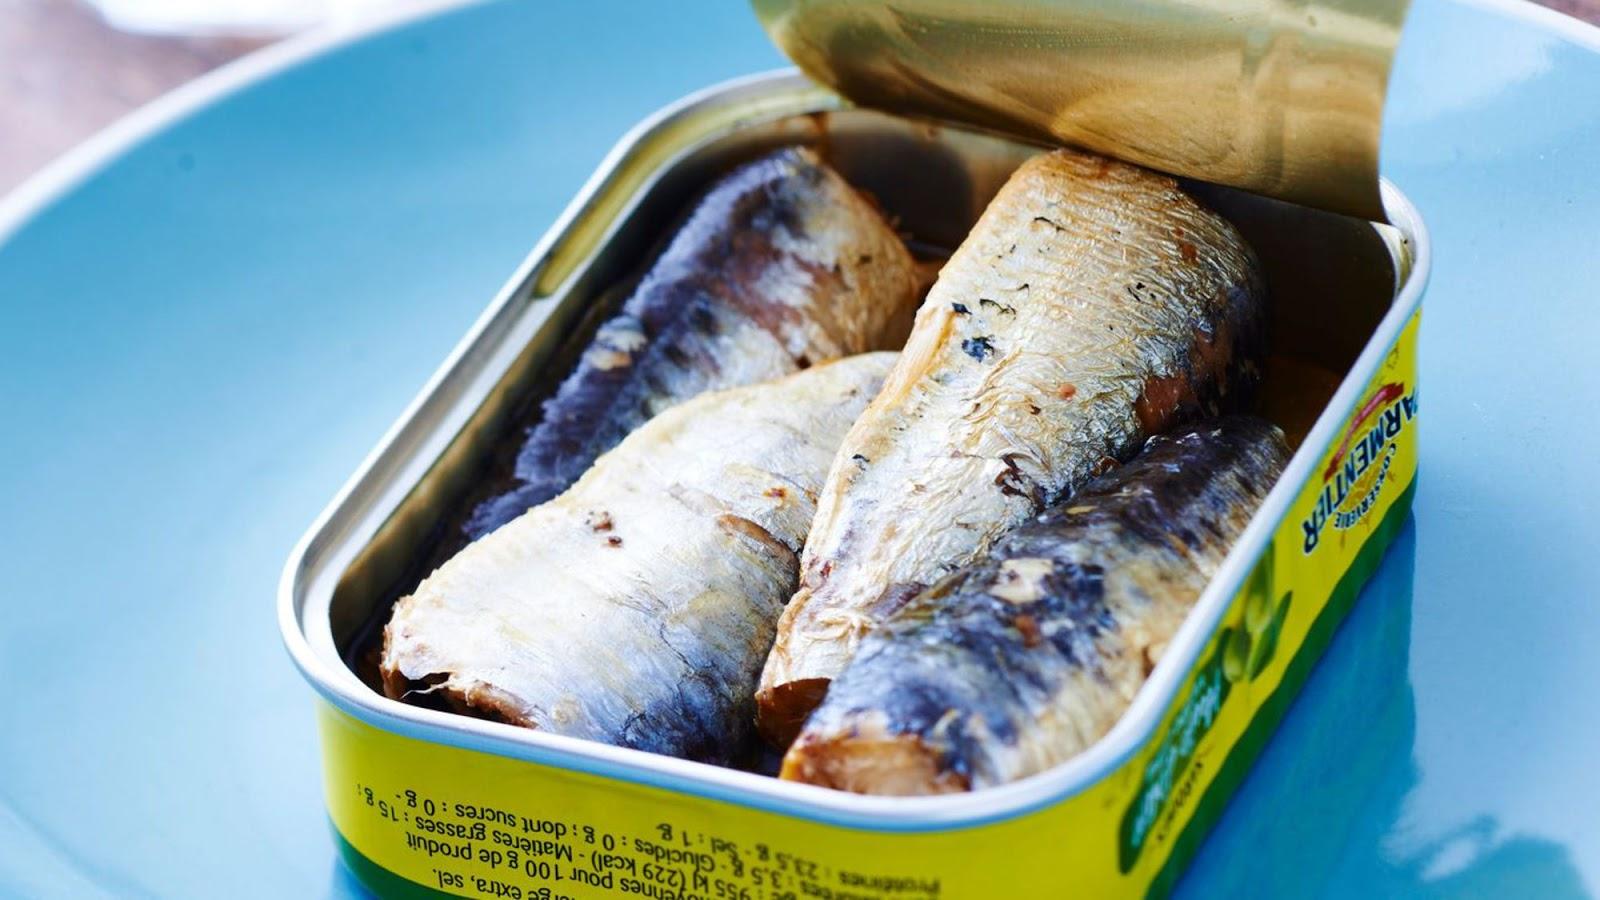 sardine-en-boite enceinte